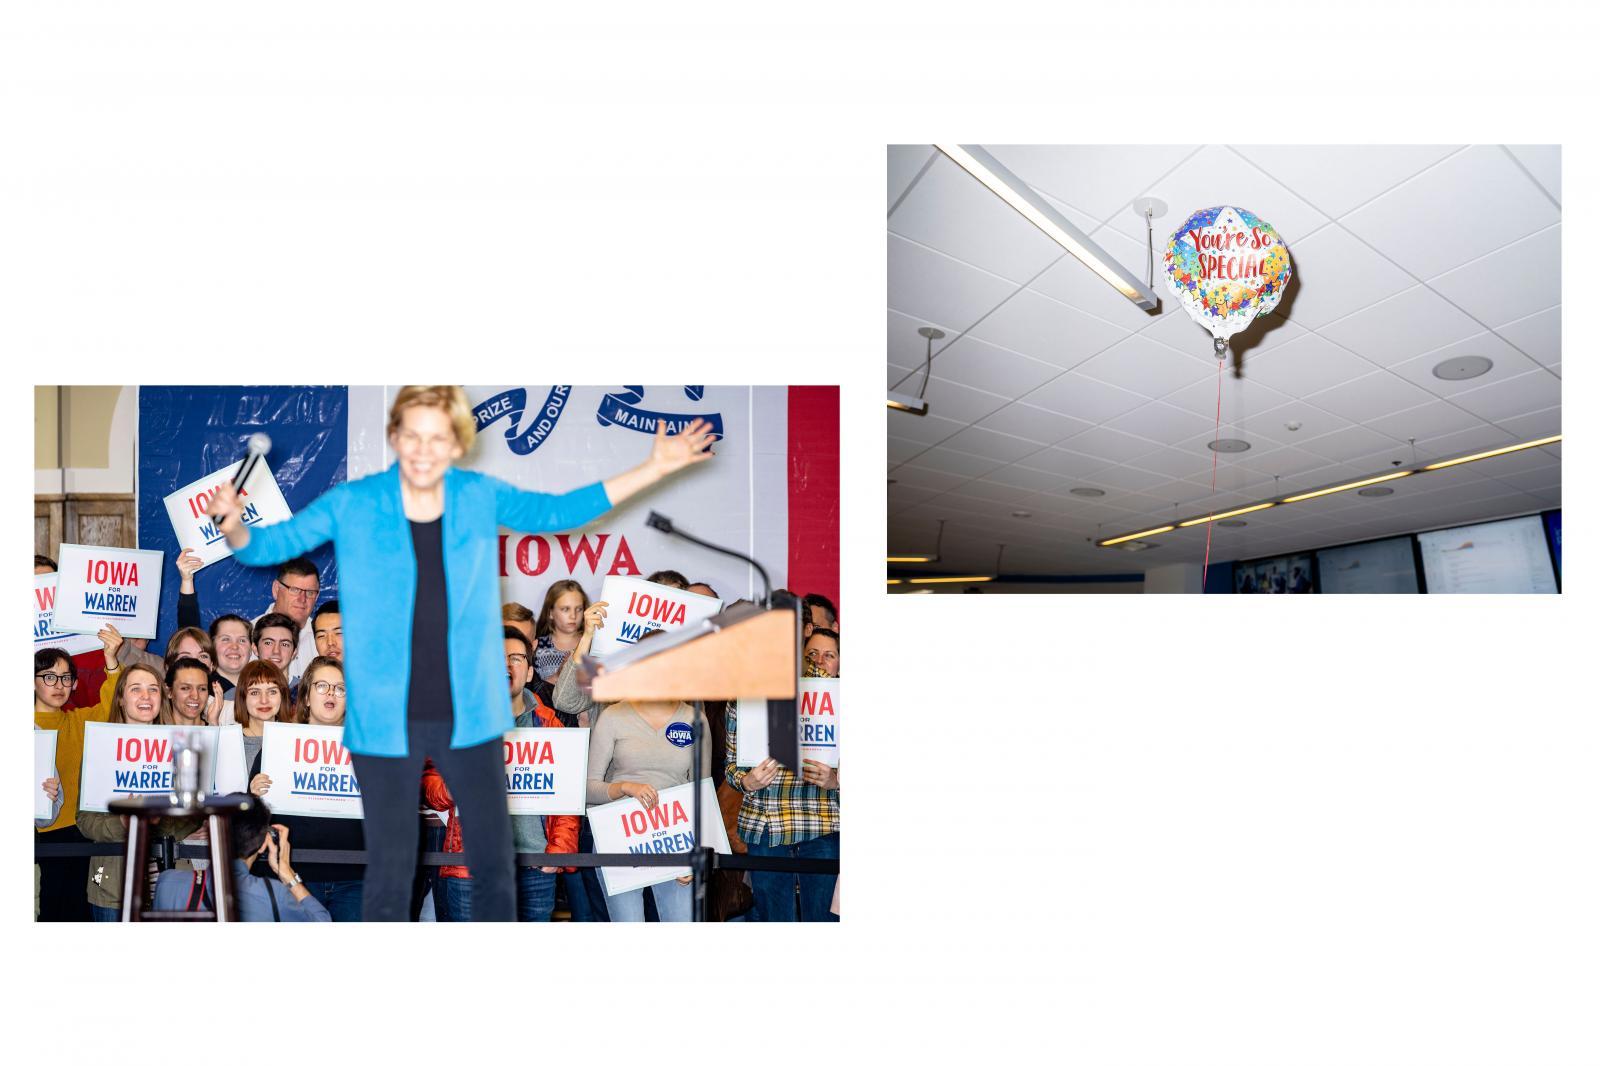 Photography image - Loading __2020_KC_McGinnis_Politics_001.JPG